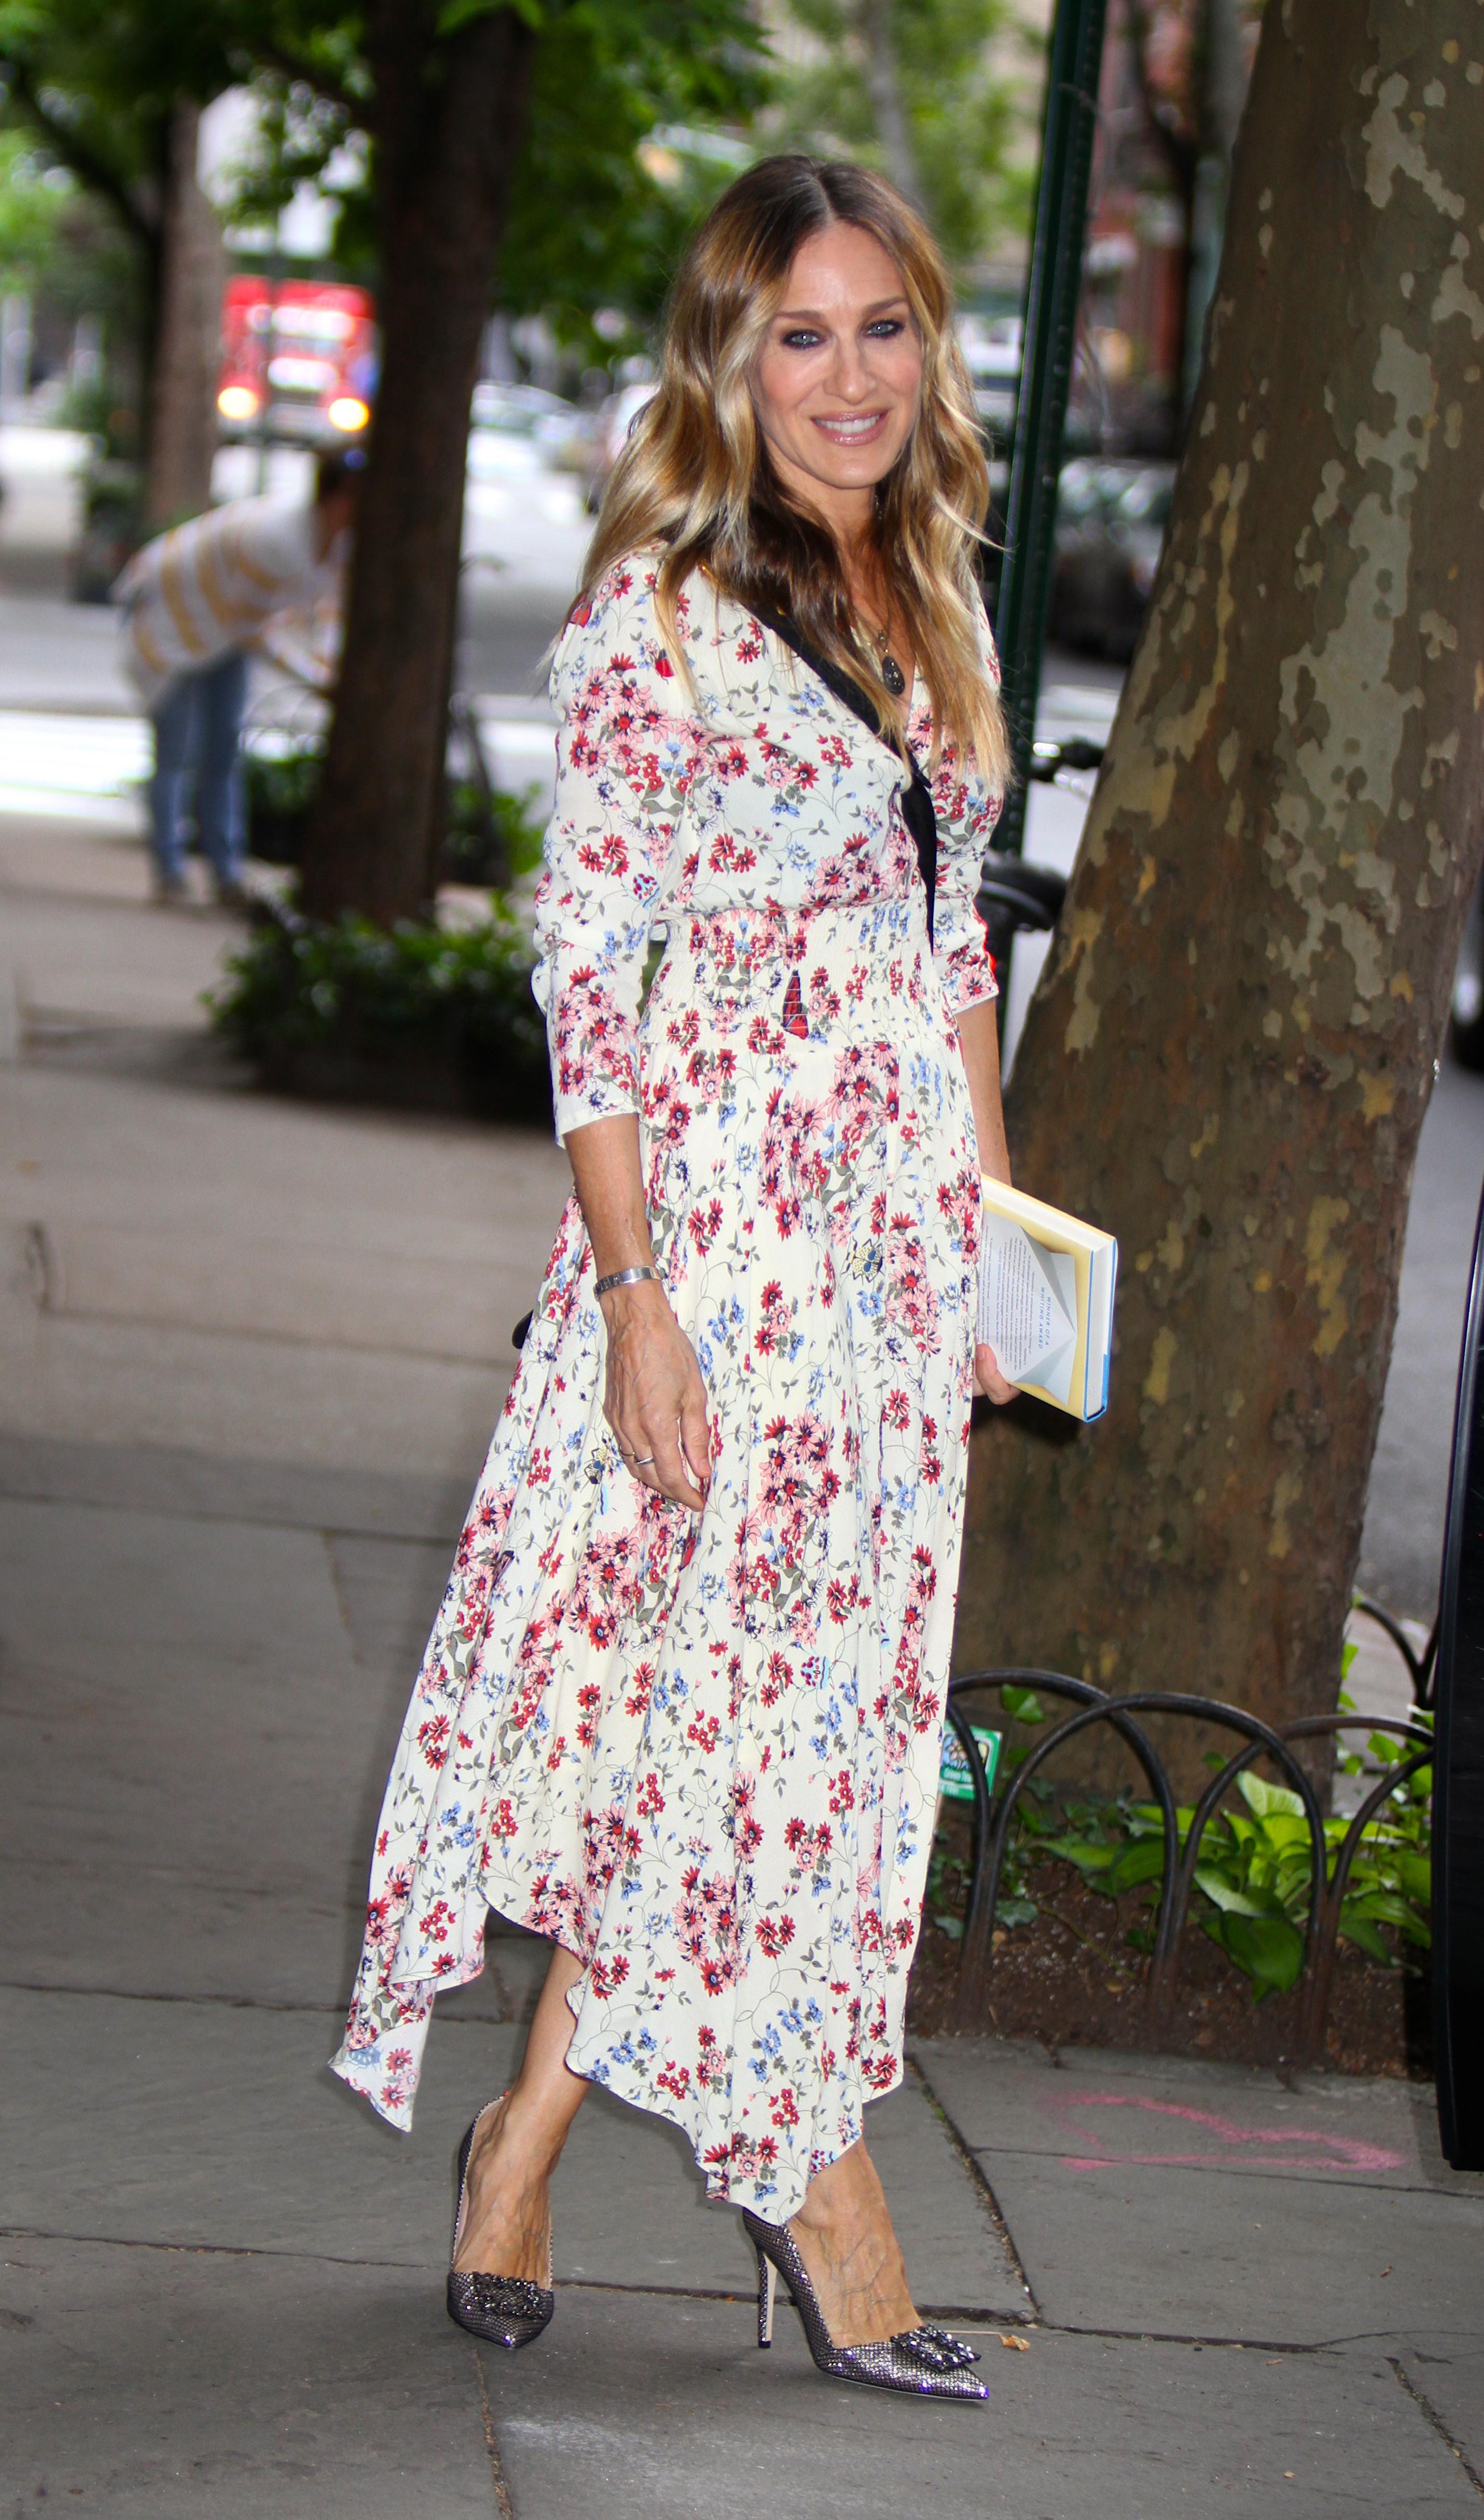 Sarah Jessica Parker, heels, new york, floral dress